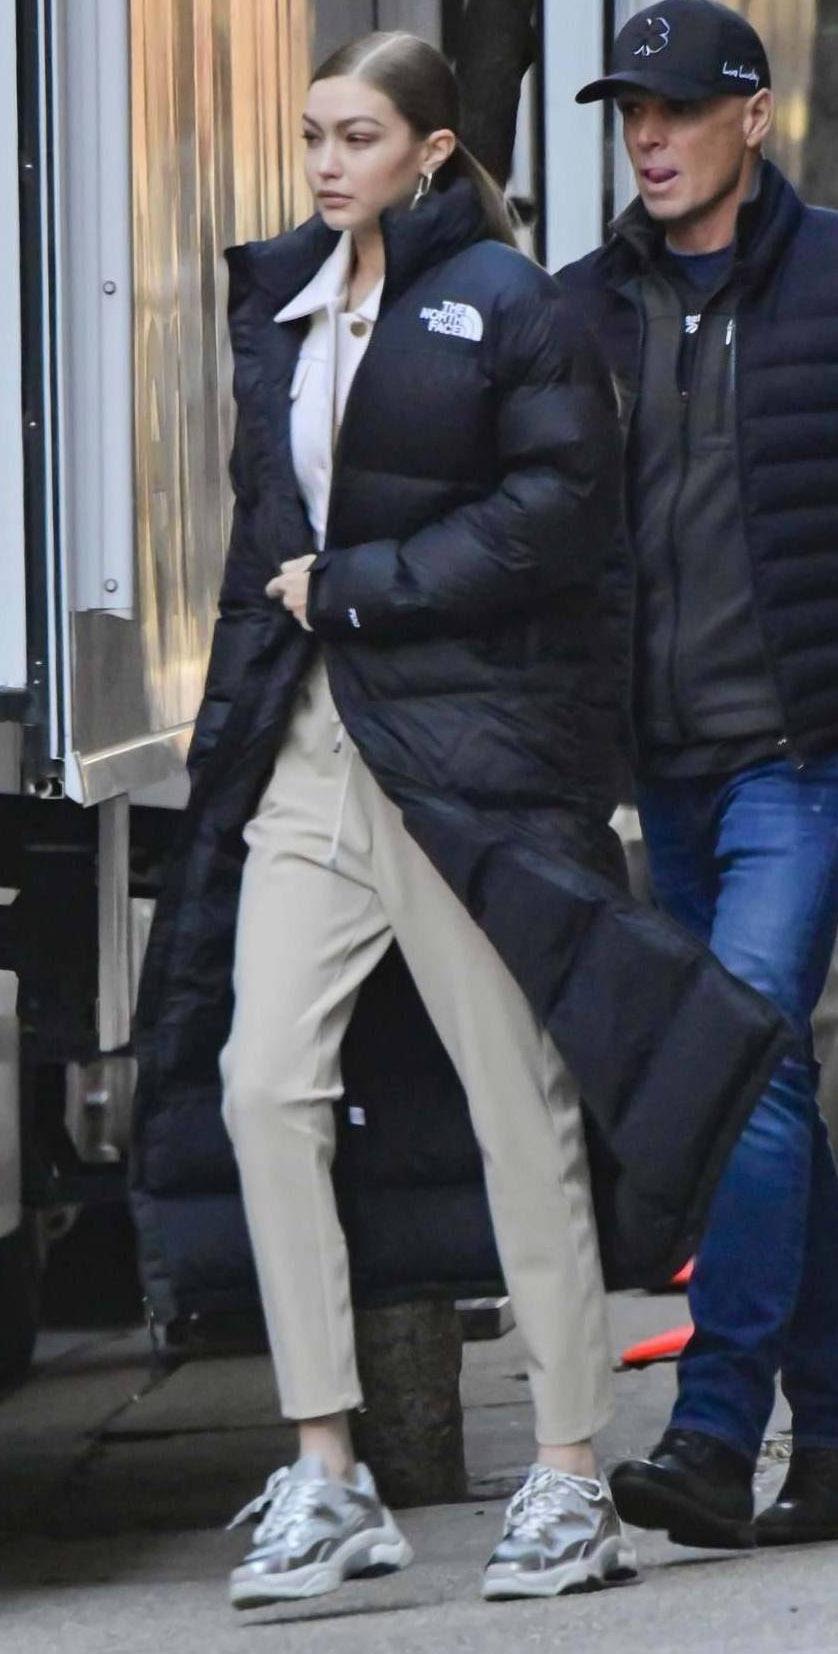 Gigi Hadid wearing long puffer coat. The North Face Nuptse Duster coat.